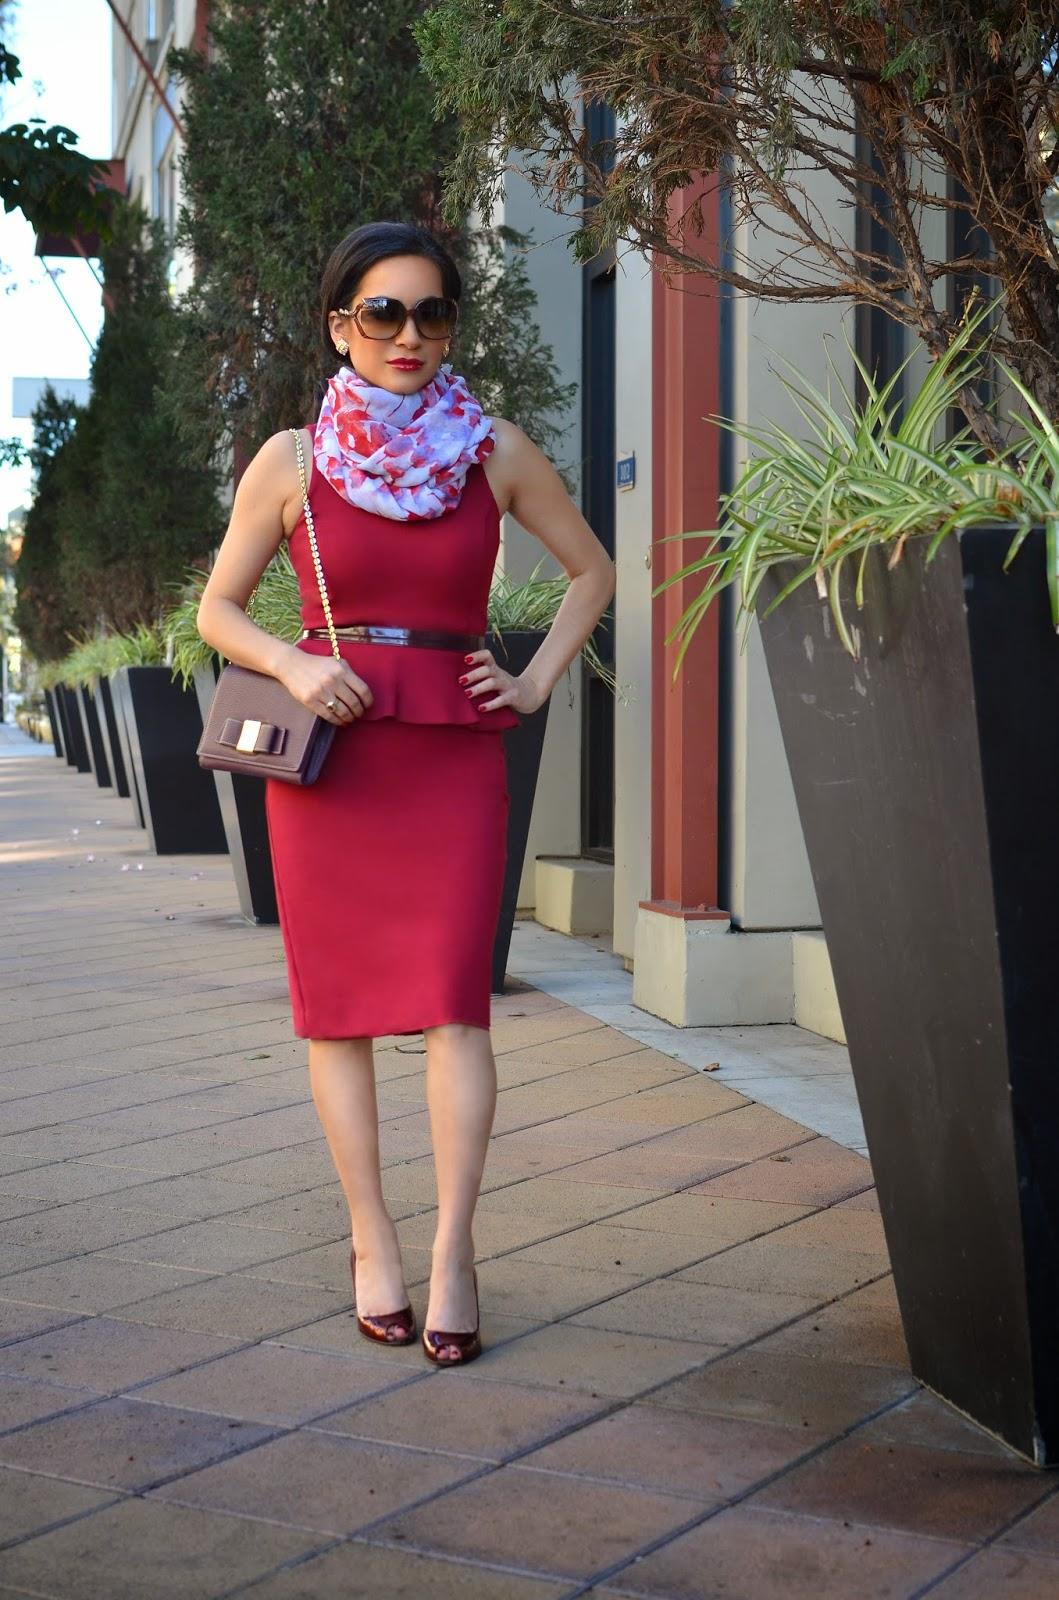 Armani Exchange Burgundy Peplum Dress Ivanka Trump Handbag Vera Wang Floral Scarf Maroon Stuart Weitzman Peep Toe Heels Gucci Sunglasses